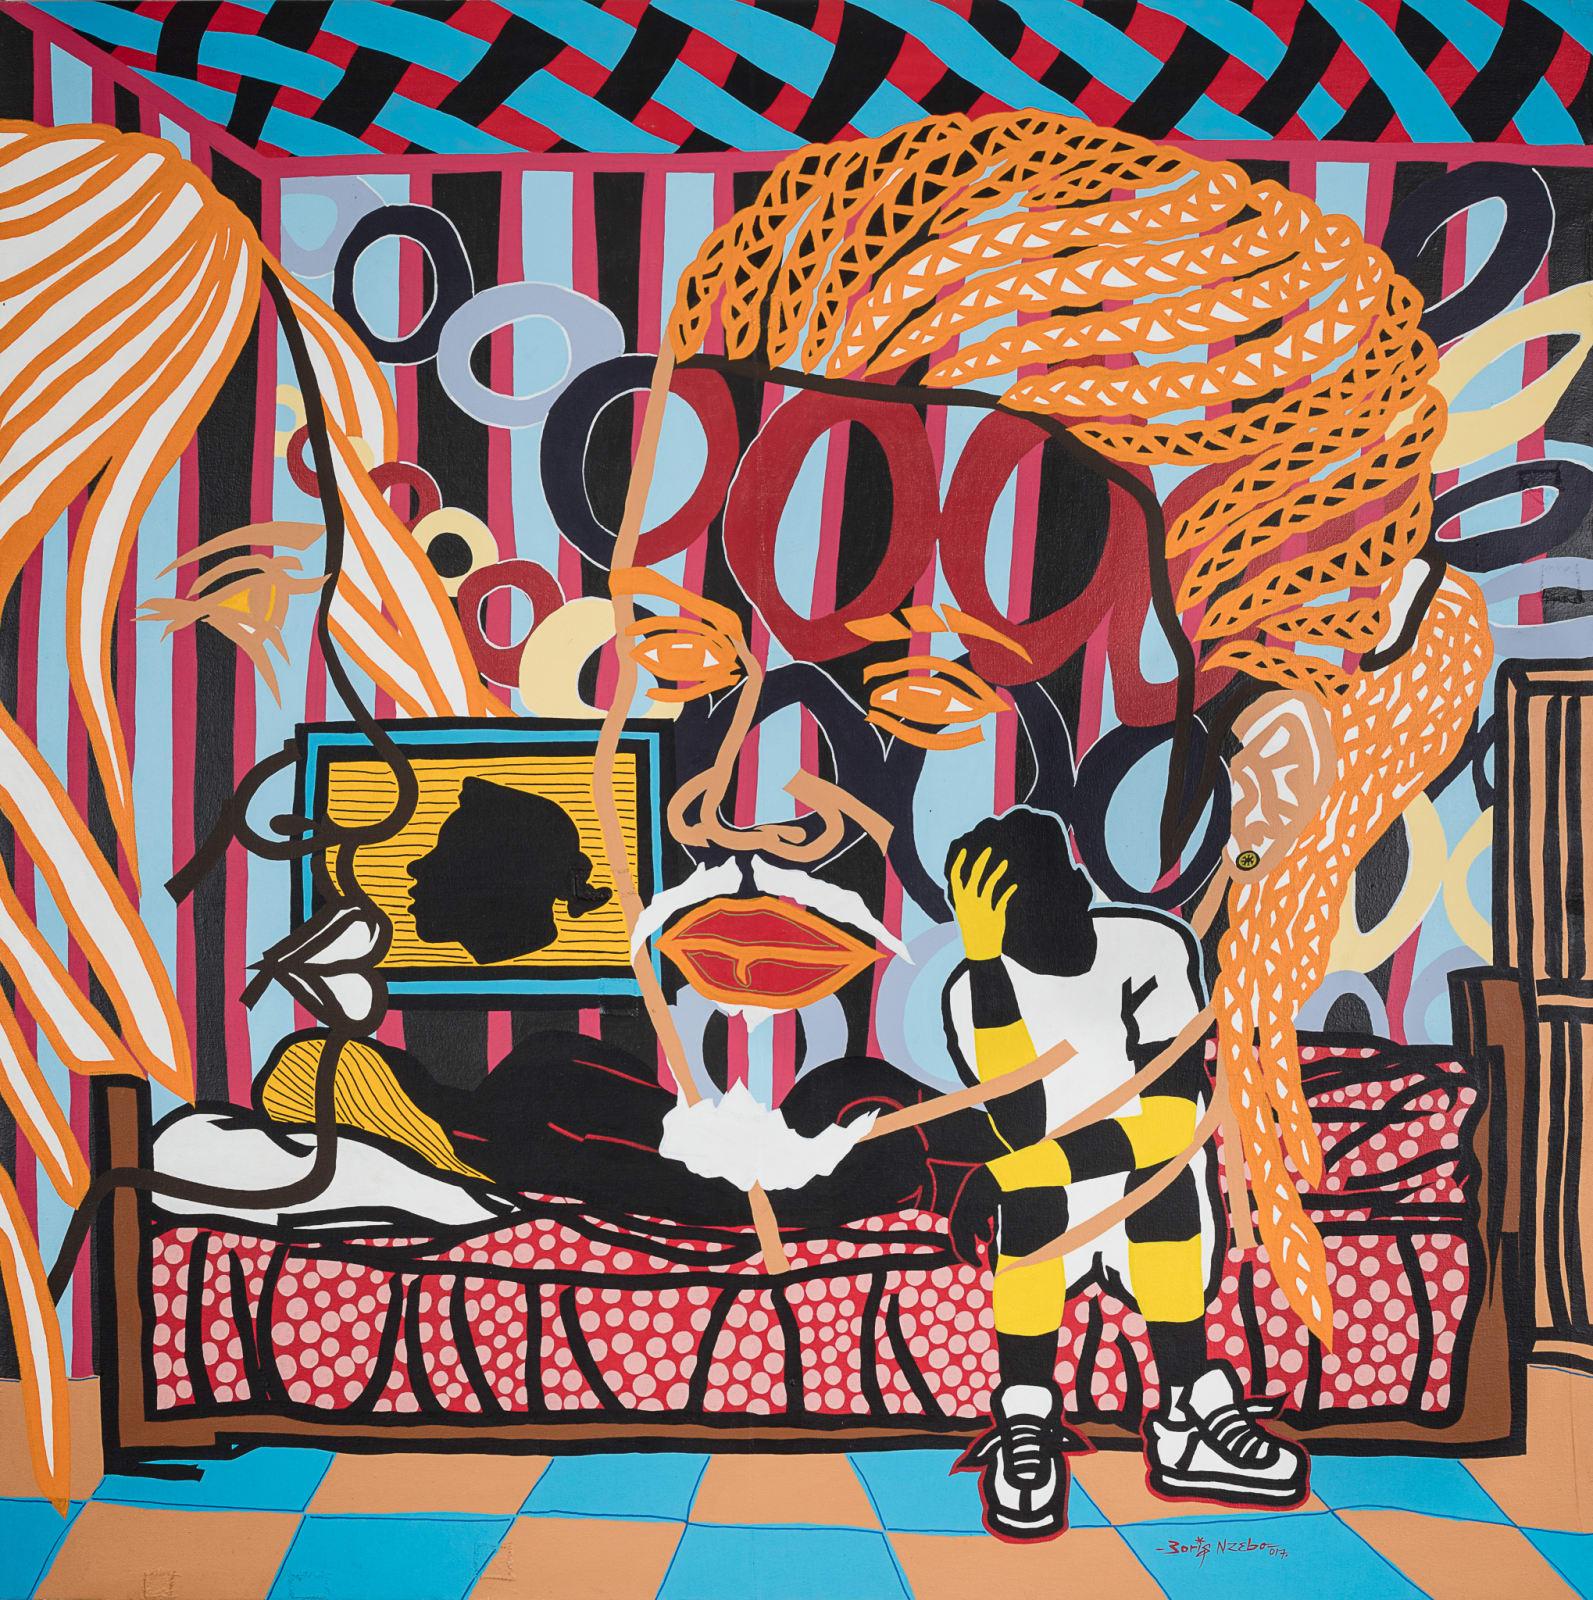 Boris Nzebo  Ampoule rouge, 2017  Acrylic and posca on canvas  150 x 150 cm